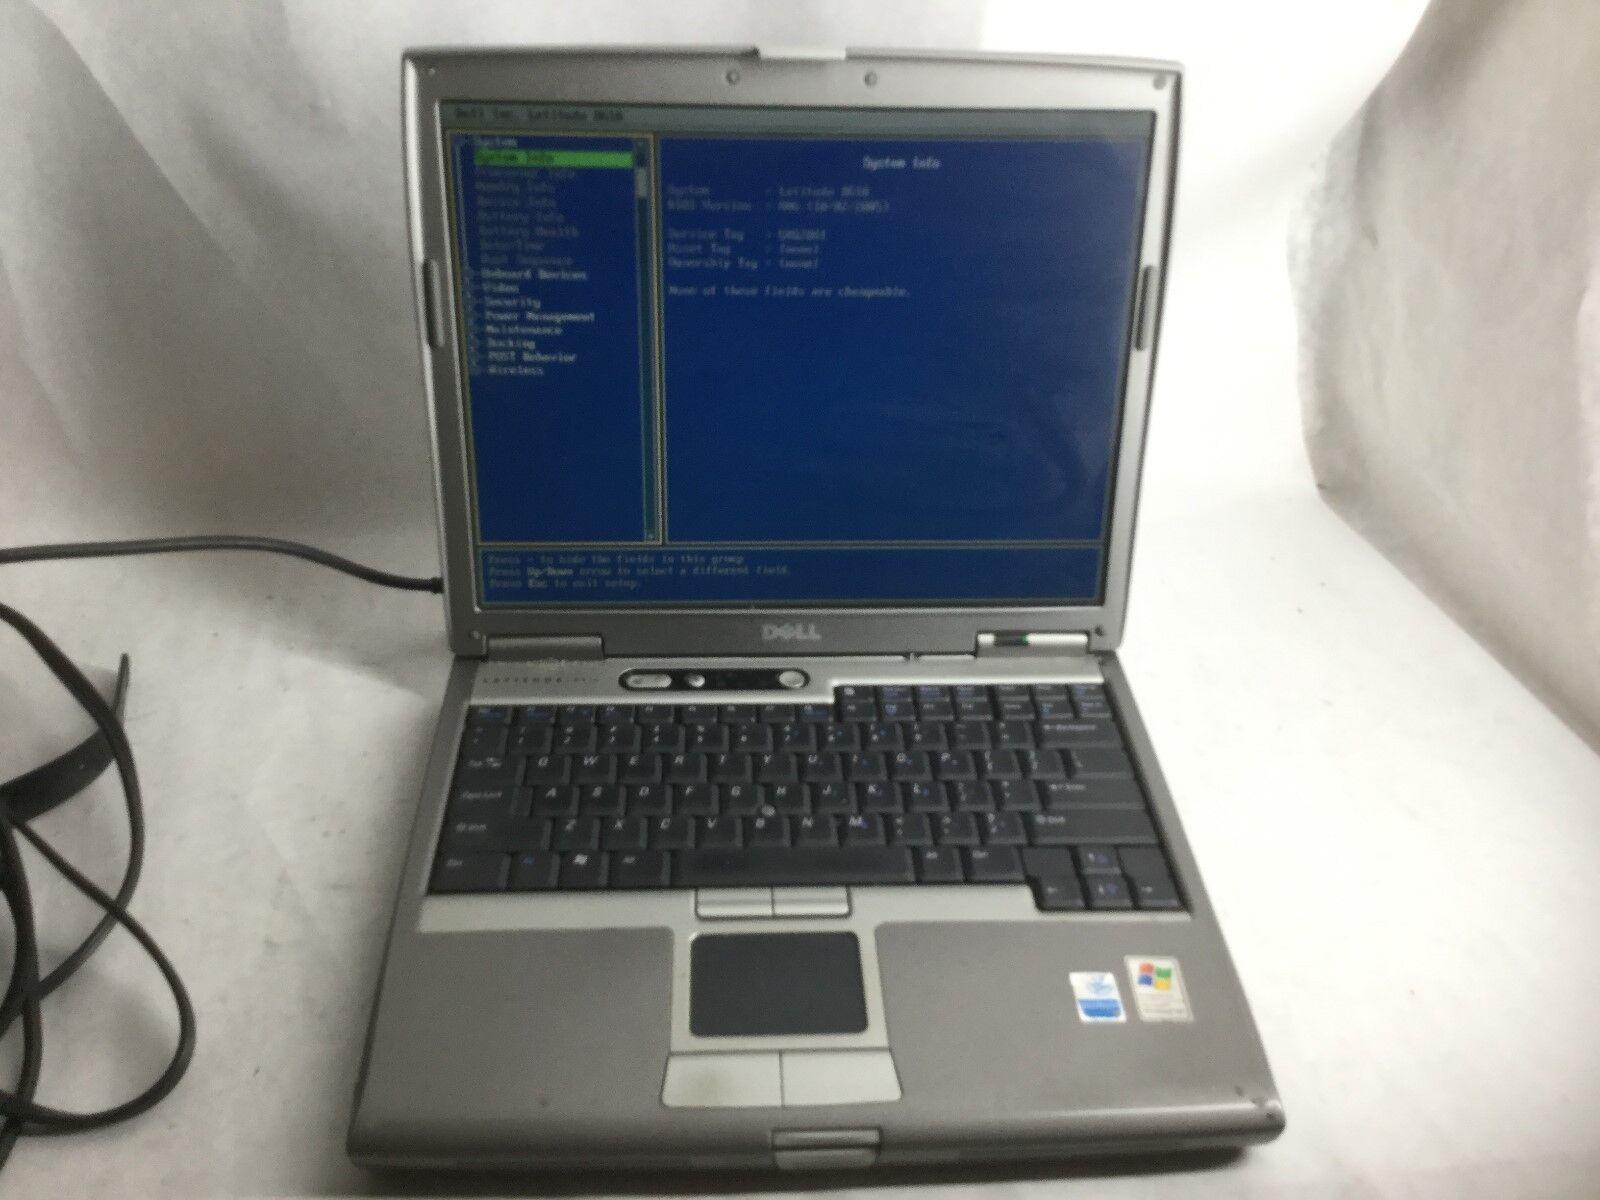 Dell Latitude D610 Intel Pentium M 1.86GHz 2gb RAM Laptop Computer -CZ